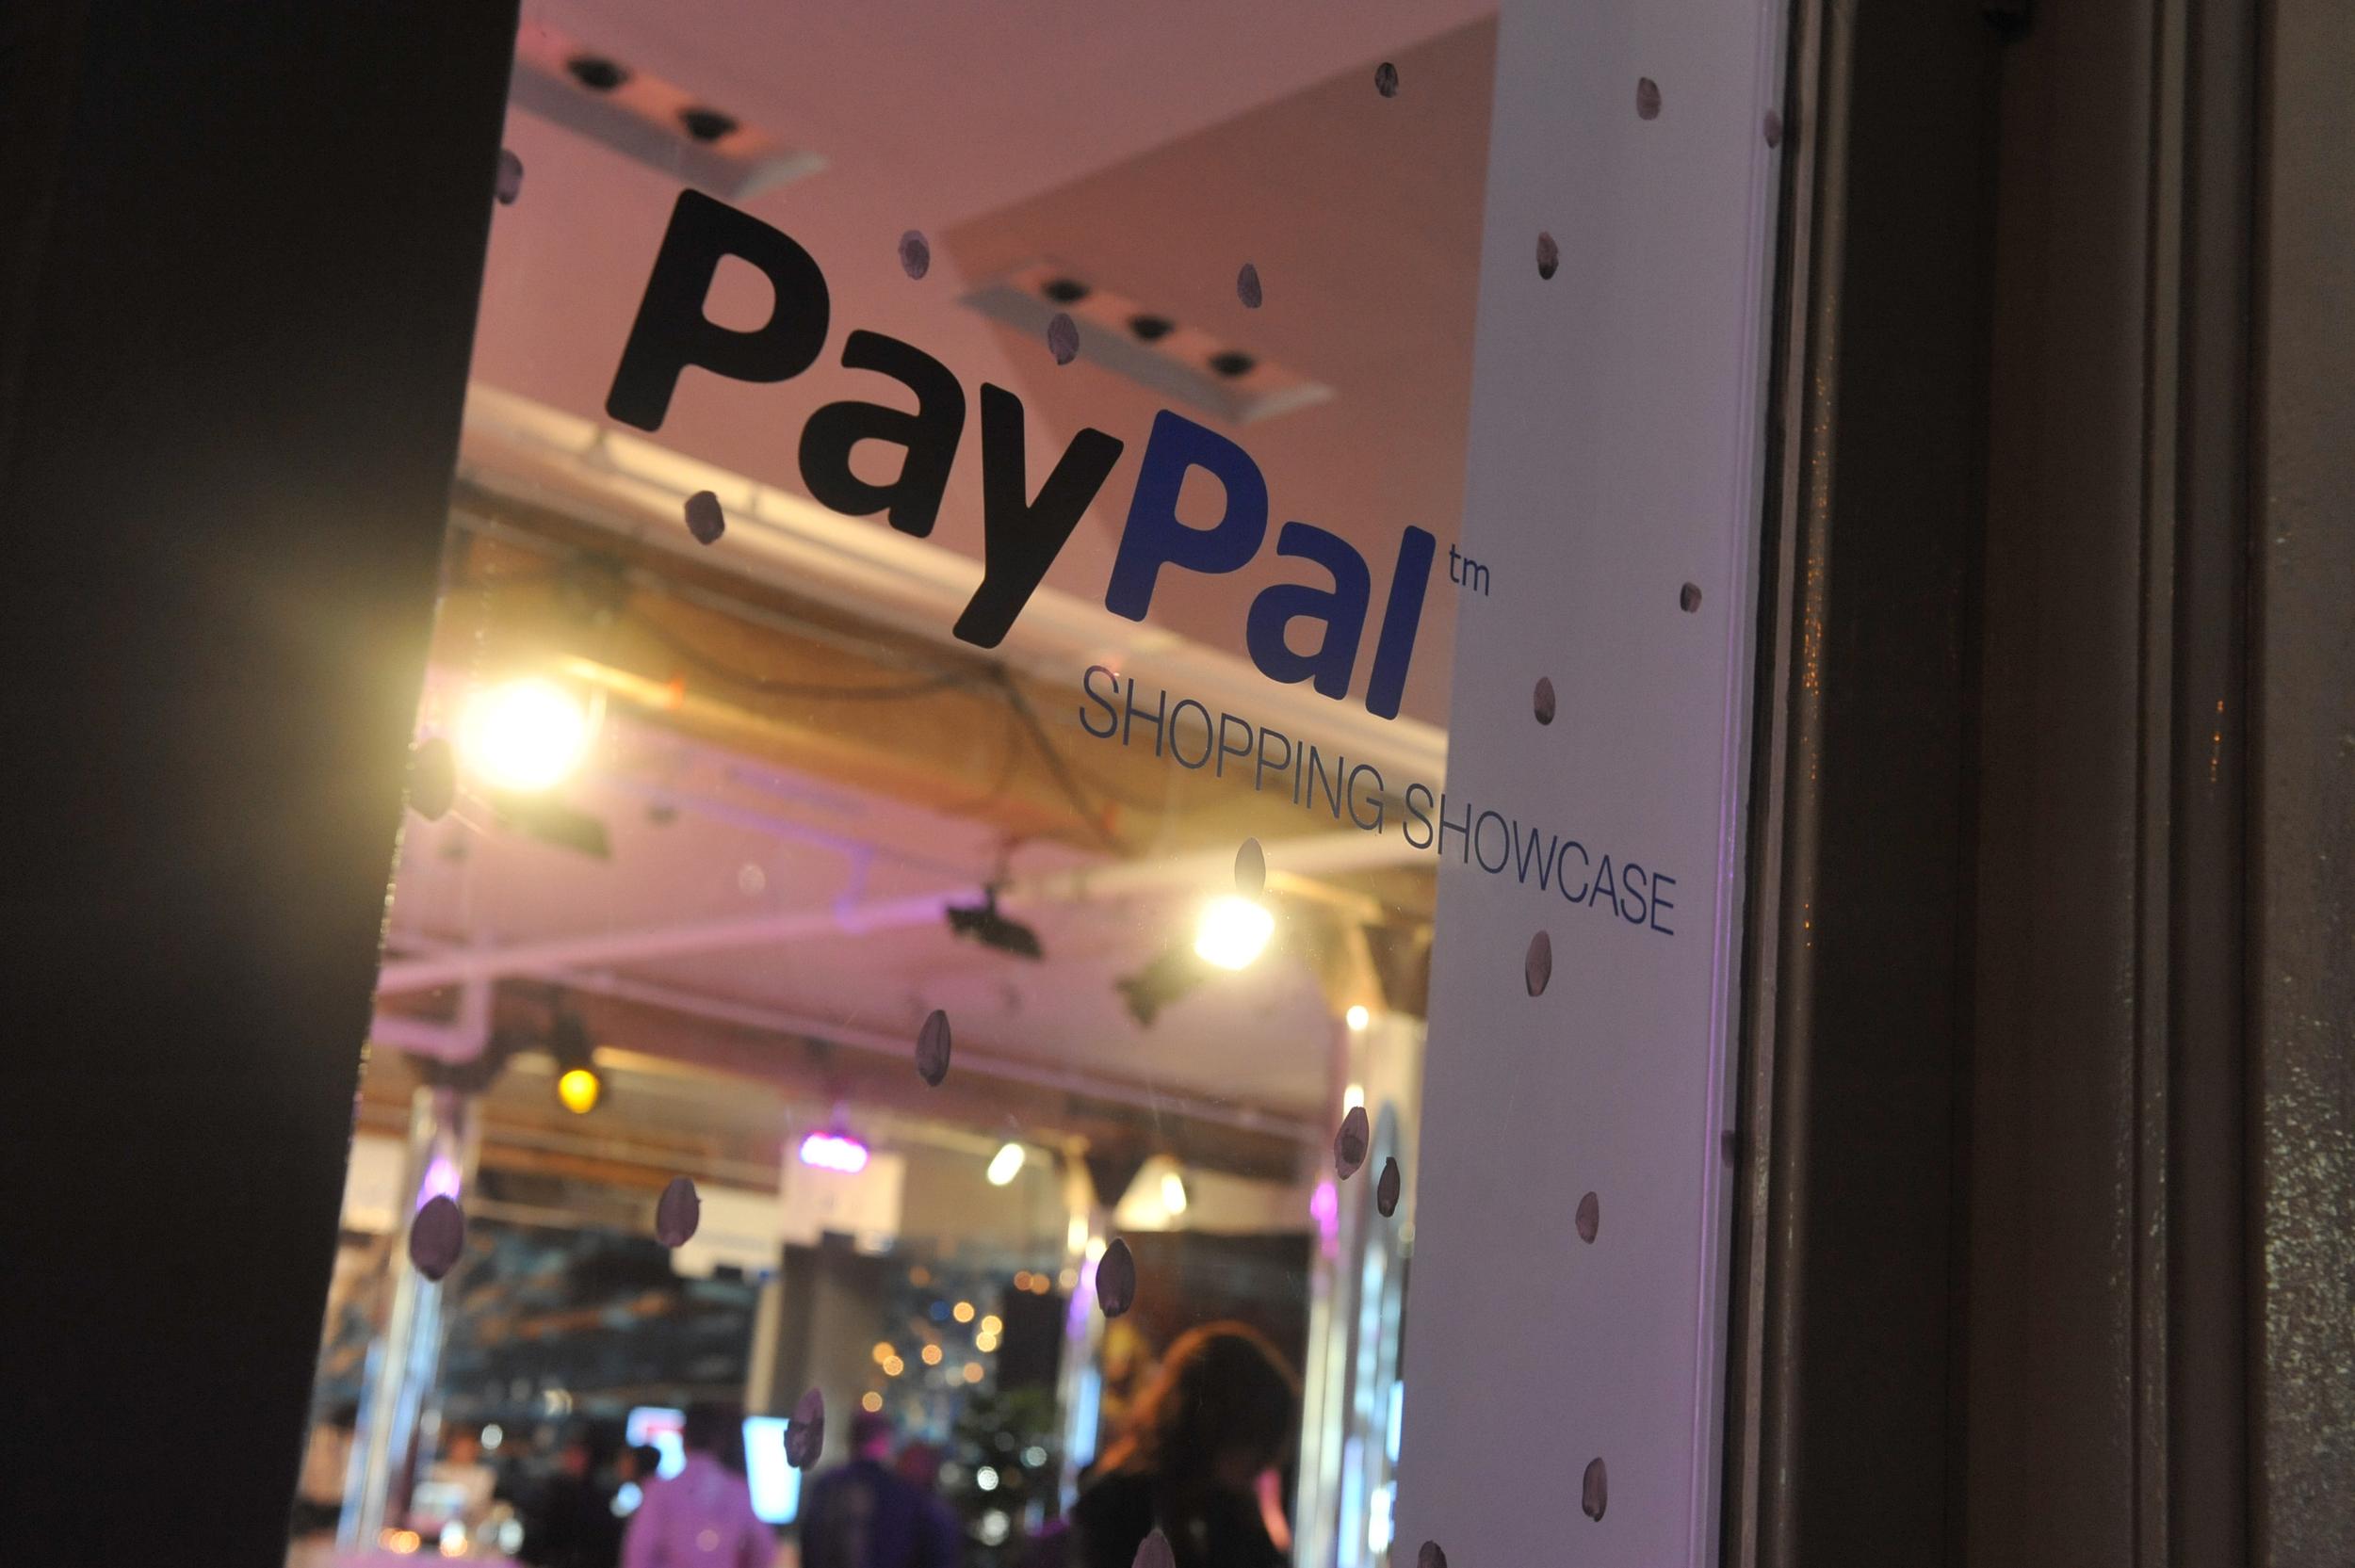 PayPal Shopping Showcase